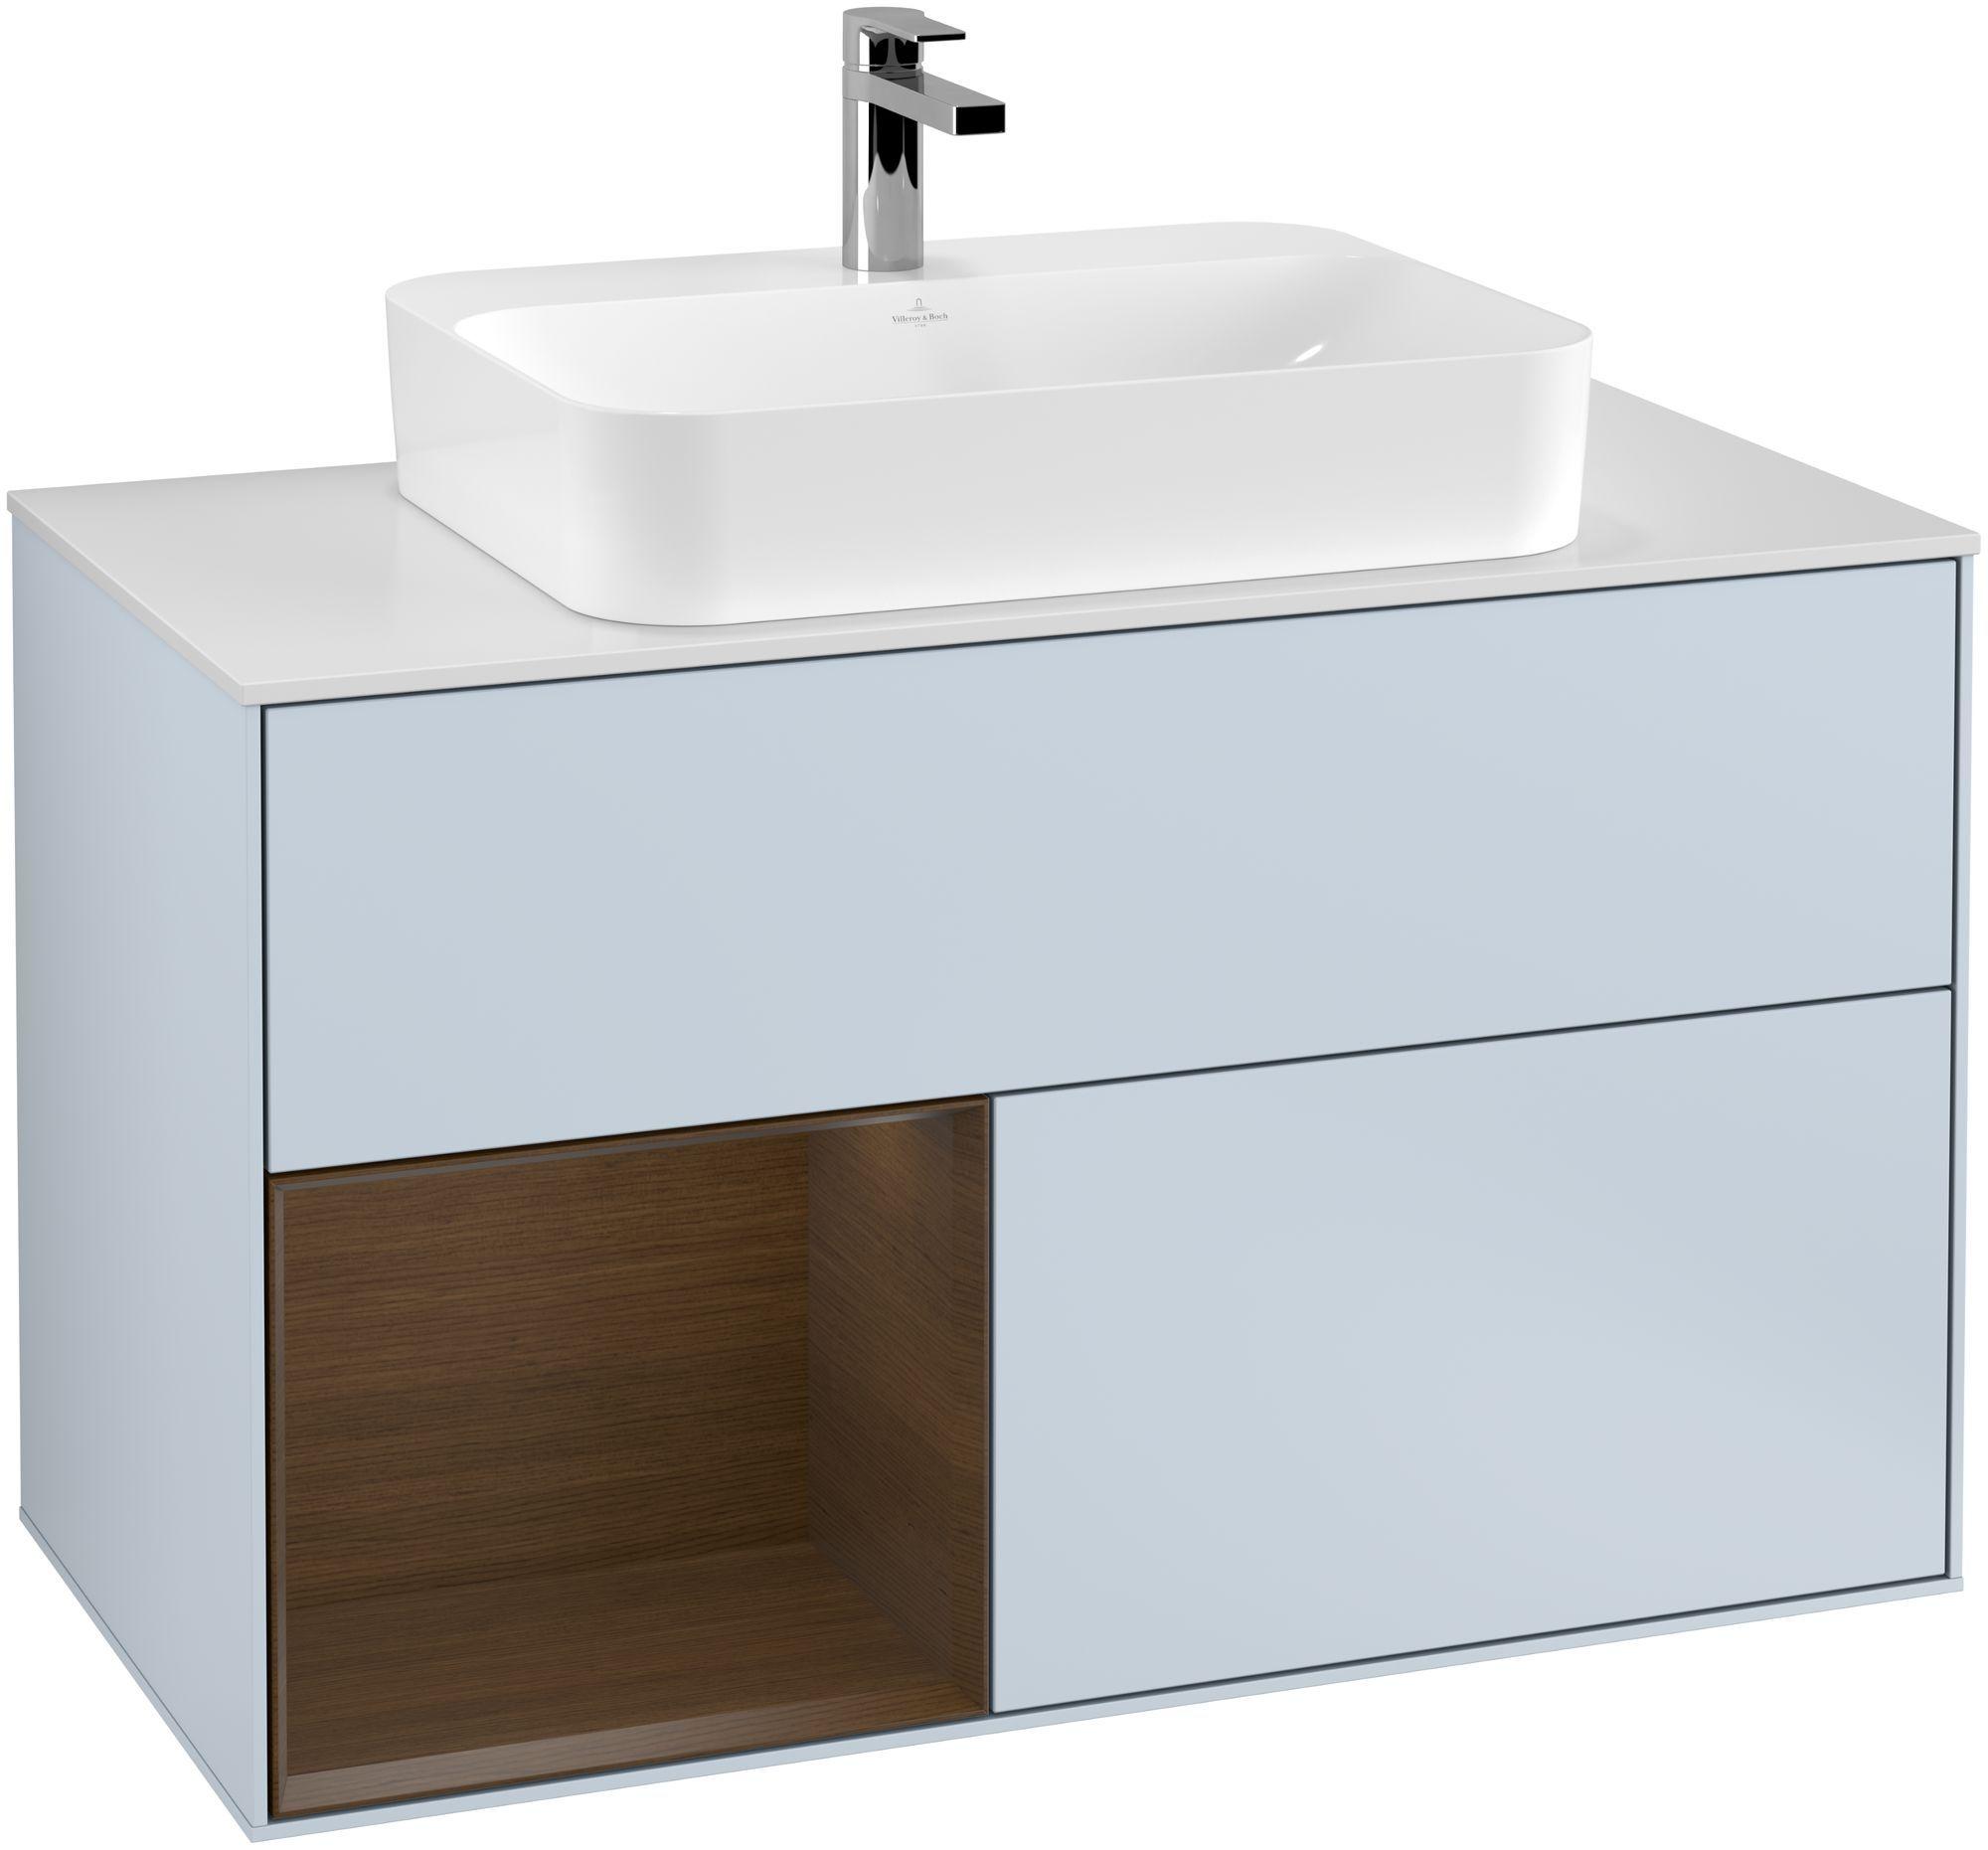 Villeroy & Boch Finion G36 Waschtischunterschrank mit Regalelement 2 Auszüge Waschtisch mittig LED-Beleuchtung B:100xH:60,3xT:50,1cm Front, Korpus: Cloud, Regal: Walnut Veneer, Glasplatte: White Matt G361GNHA